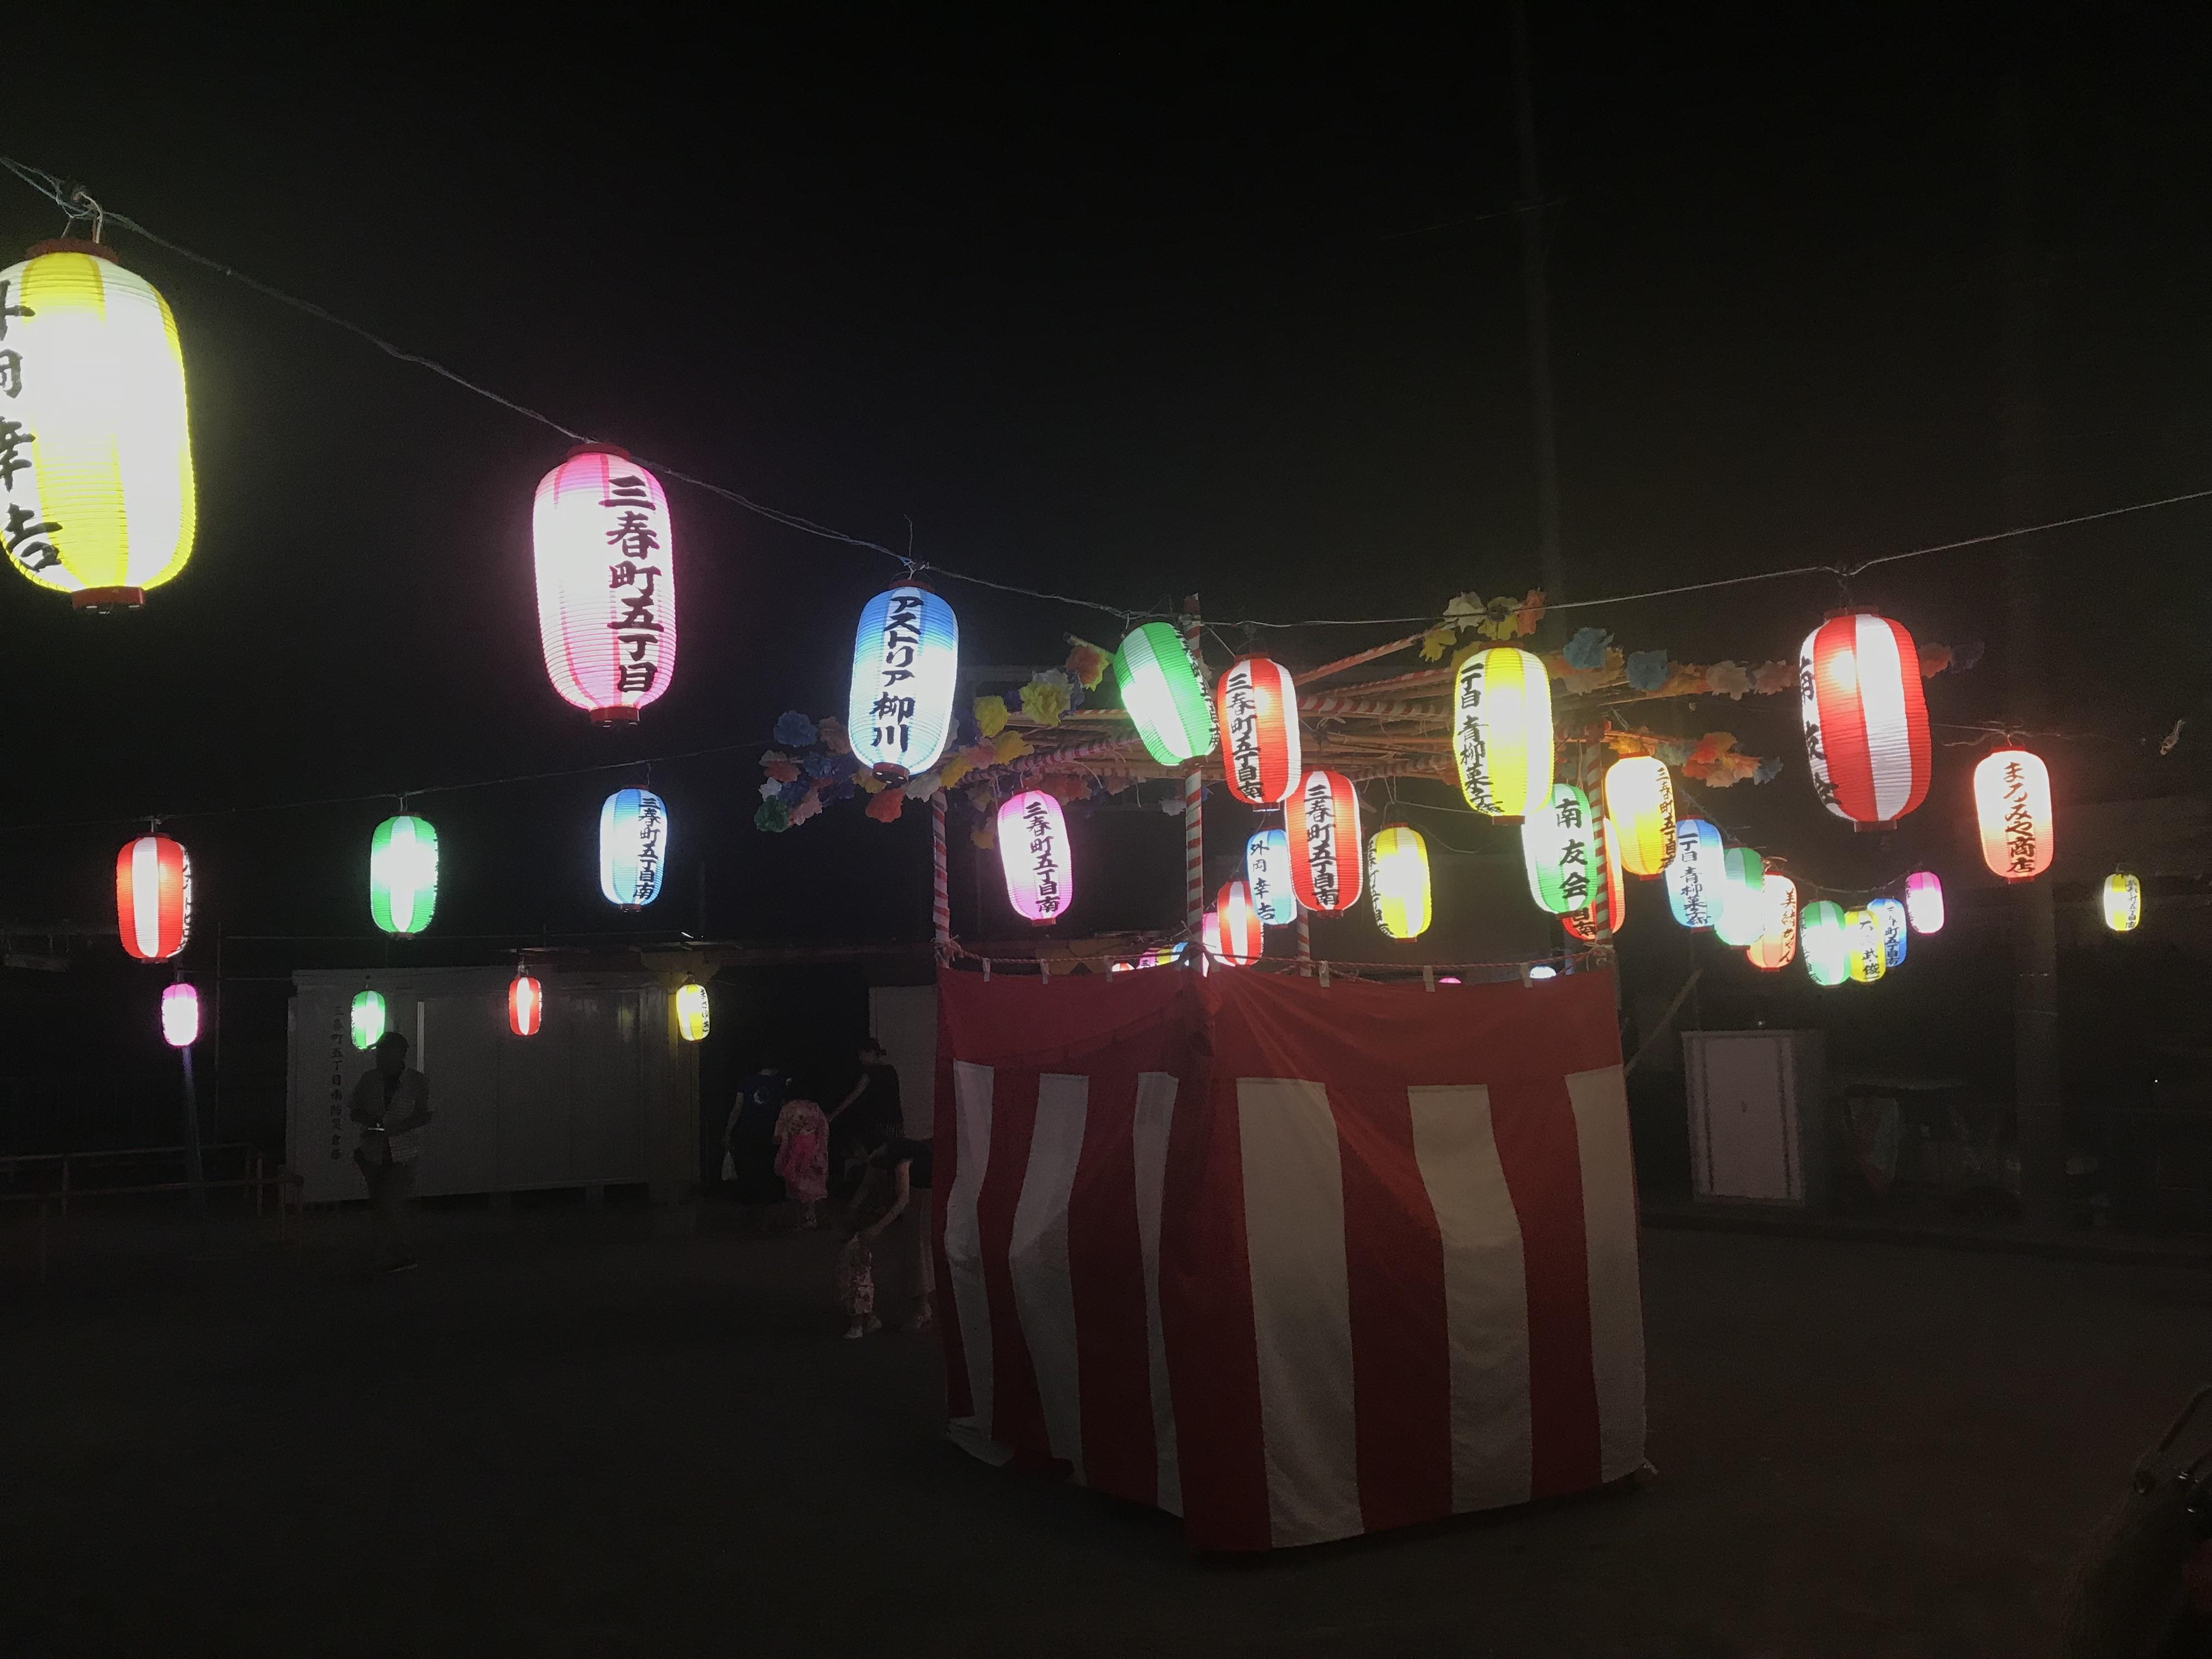 A picture of the lanters lit at Bon Odori festival